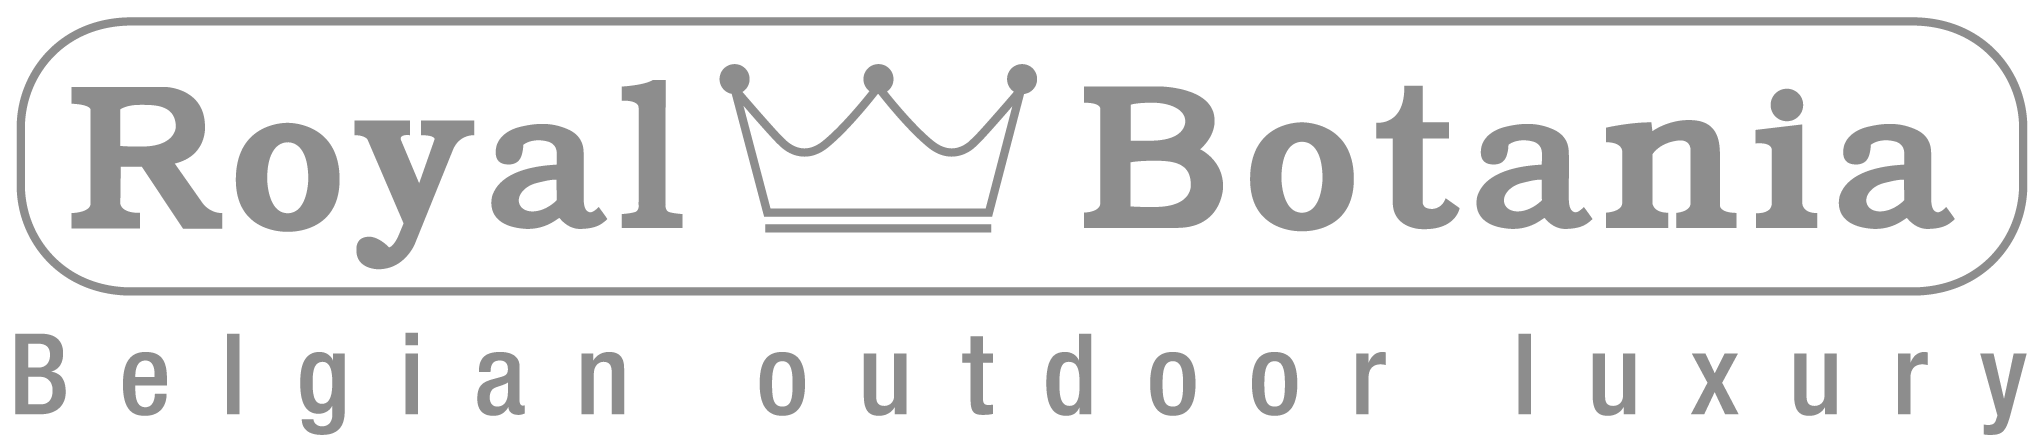 royal botania gartenmöbel